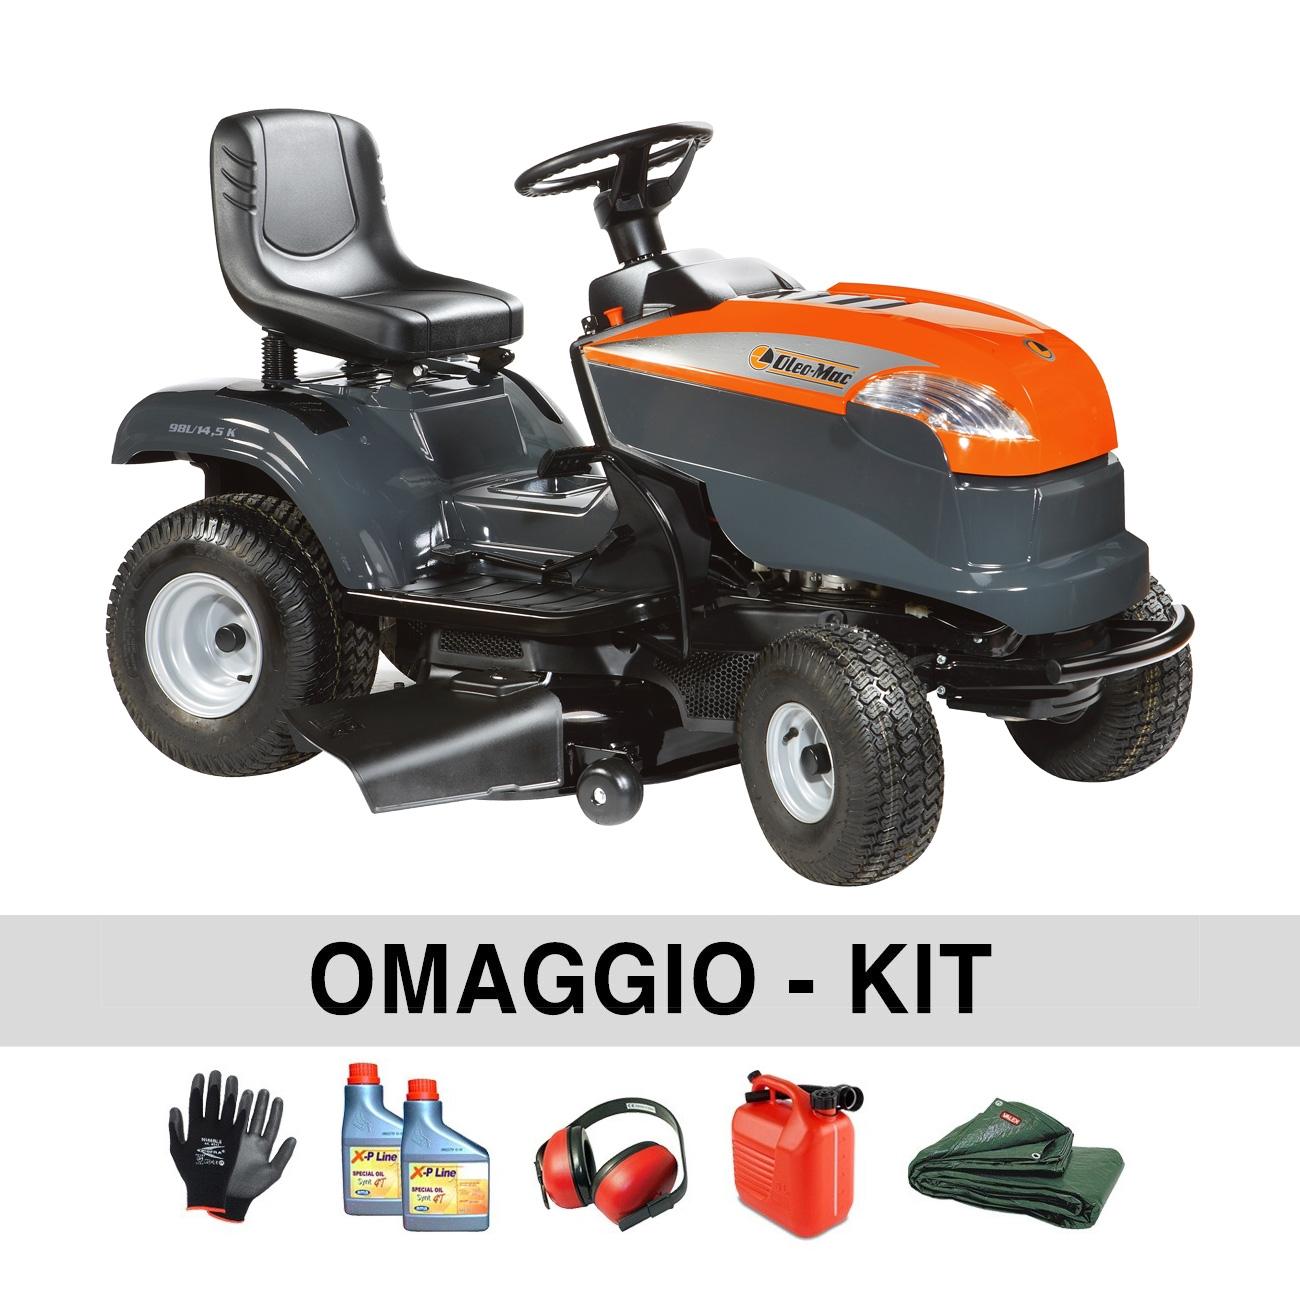 Image of Trattorino tagliaerba OleoMac OM 98 L/14,5 K